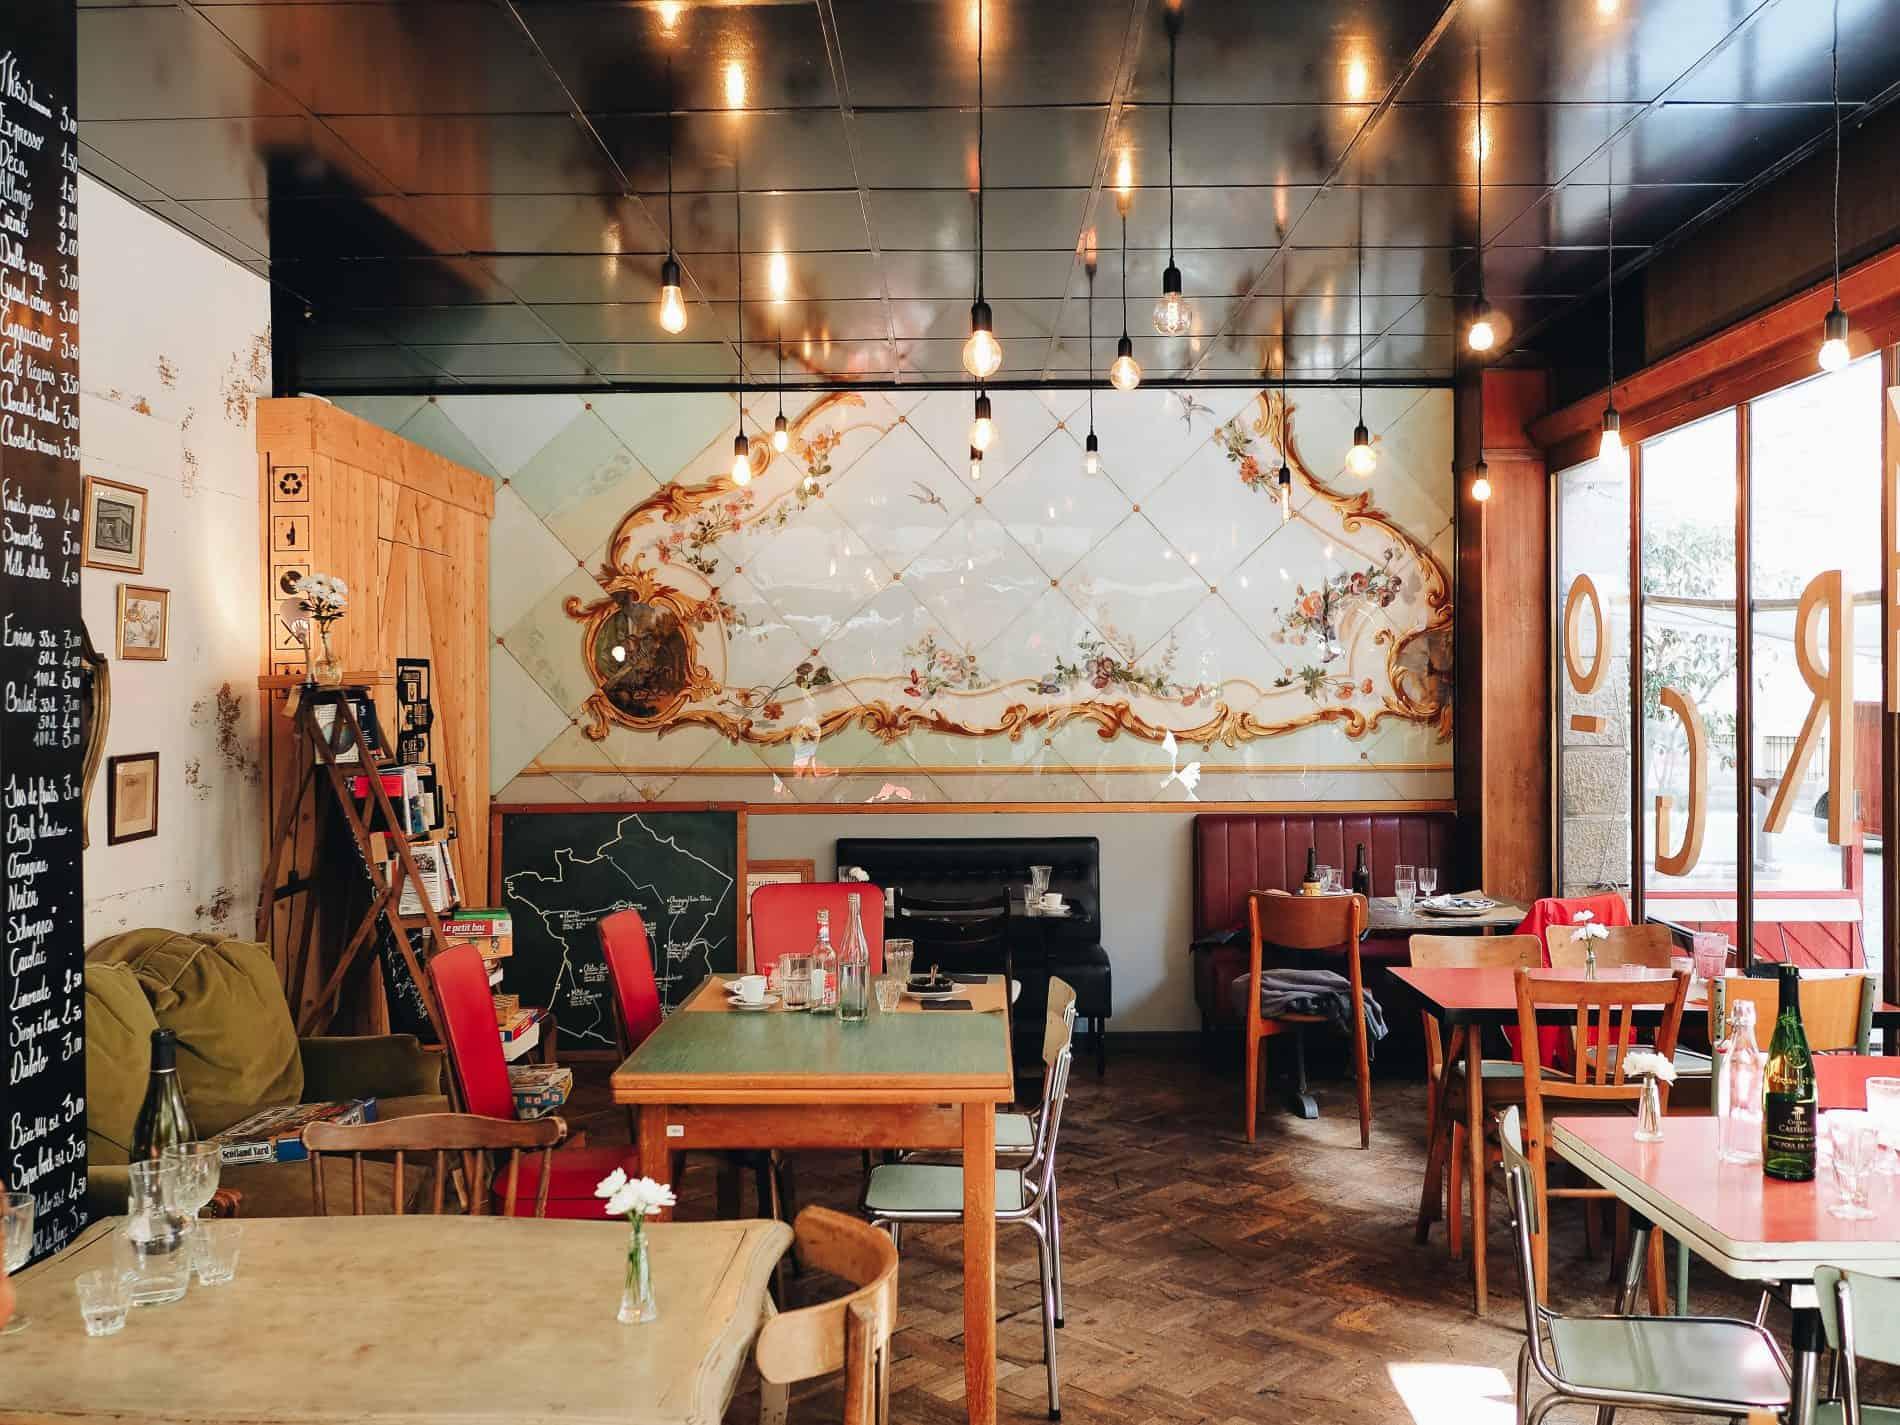 Saint-Malo Bretagne cityguide bonnes adresses cargo culte blog lifestyle doc voyage lili in wonderland